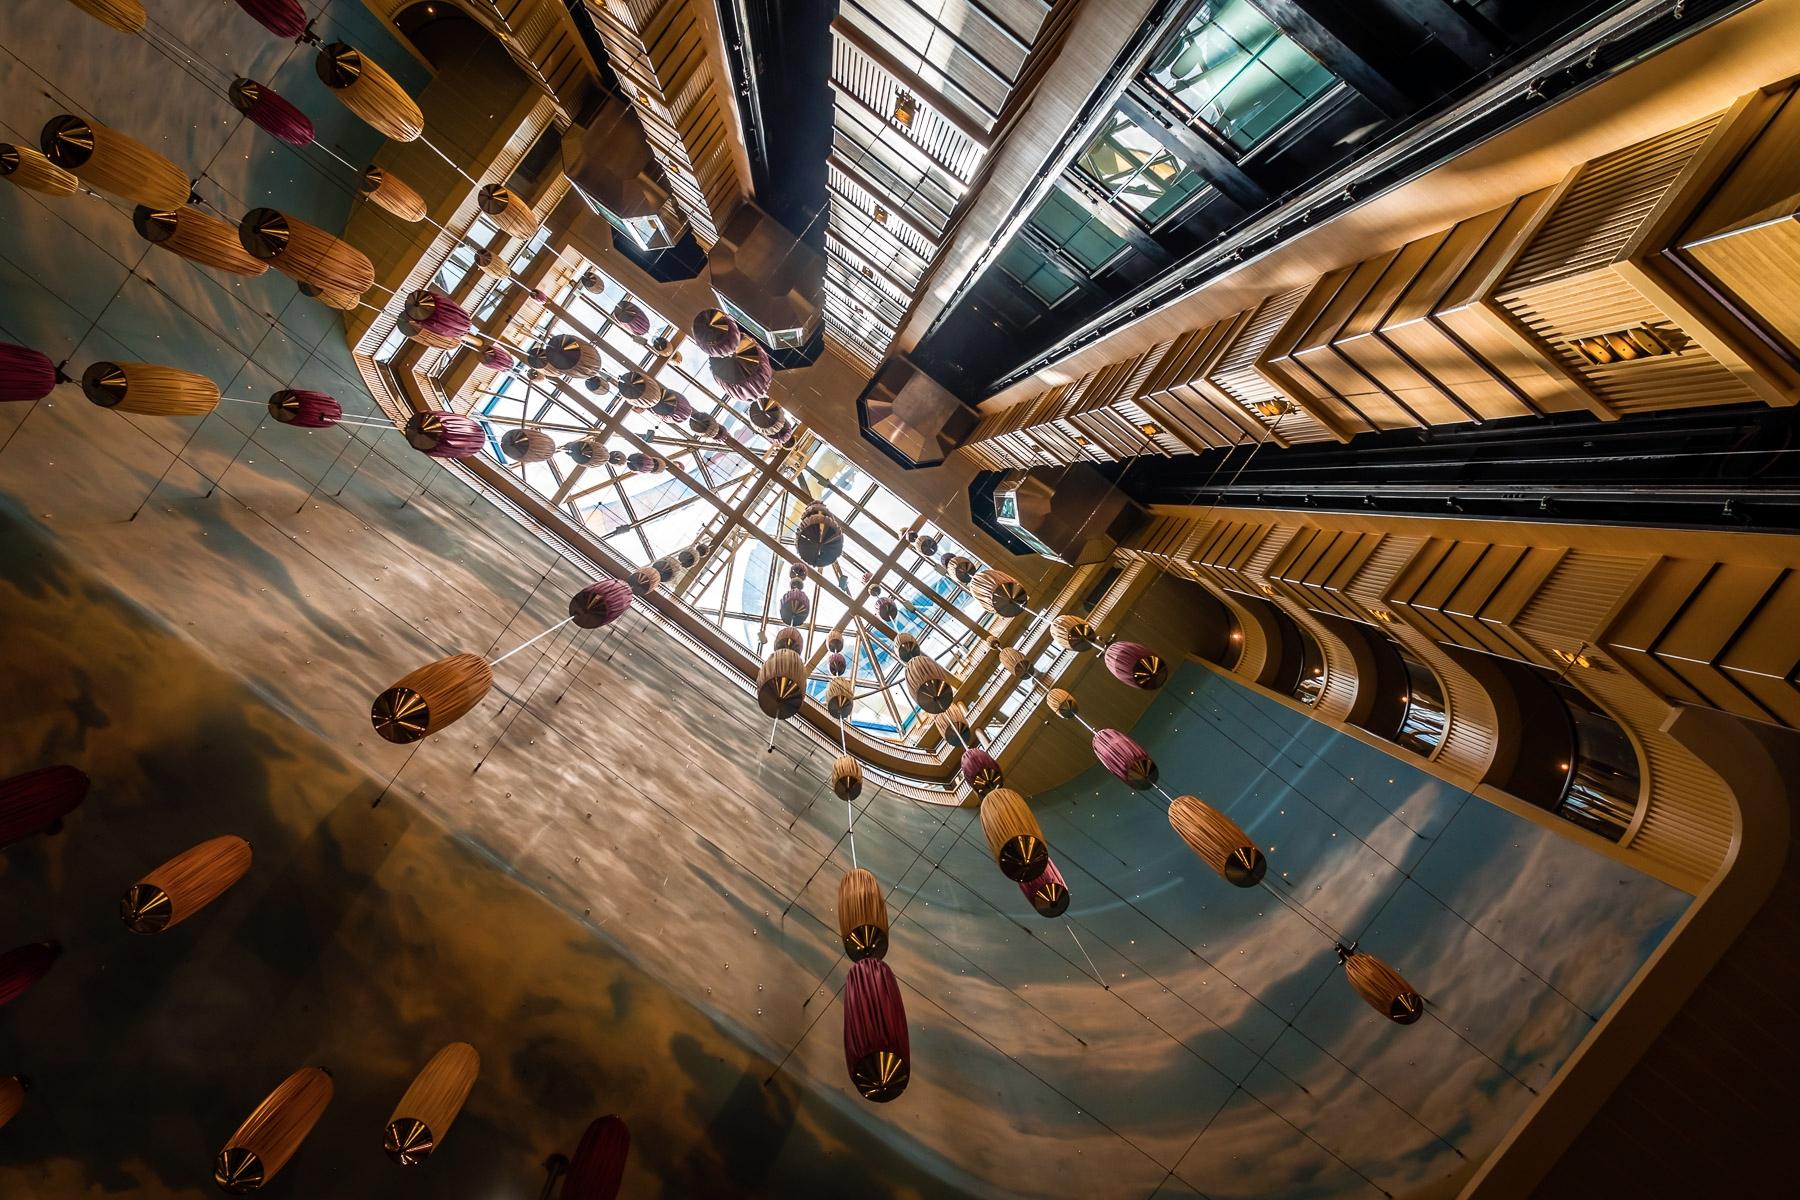 Atrium upward atrium cruise shi - mattgharvey   ello